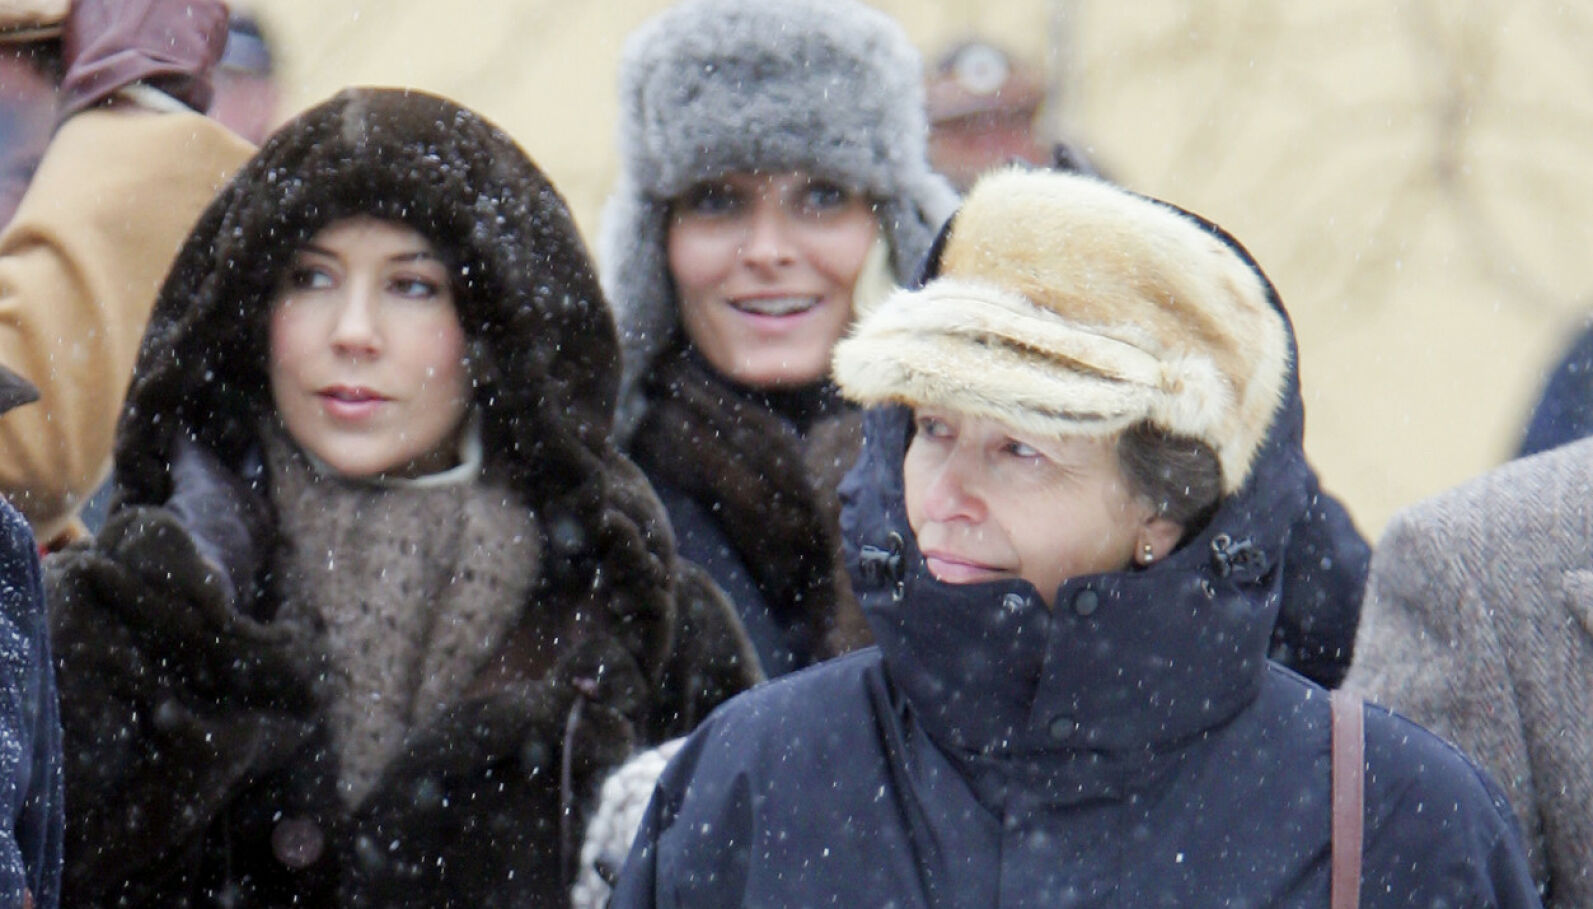 HOLDT HODET KALDT: Prinsesse Anne sammen med kronprinsesse Mary og kronprinsesse Mette-Marit på Folkemuseet i 2007. Foto: NTB.